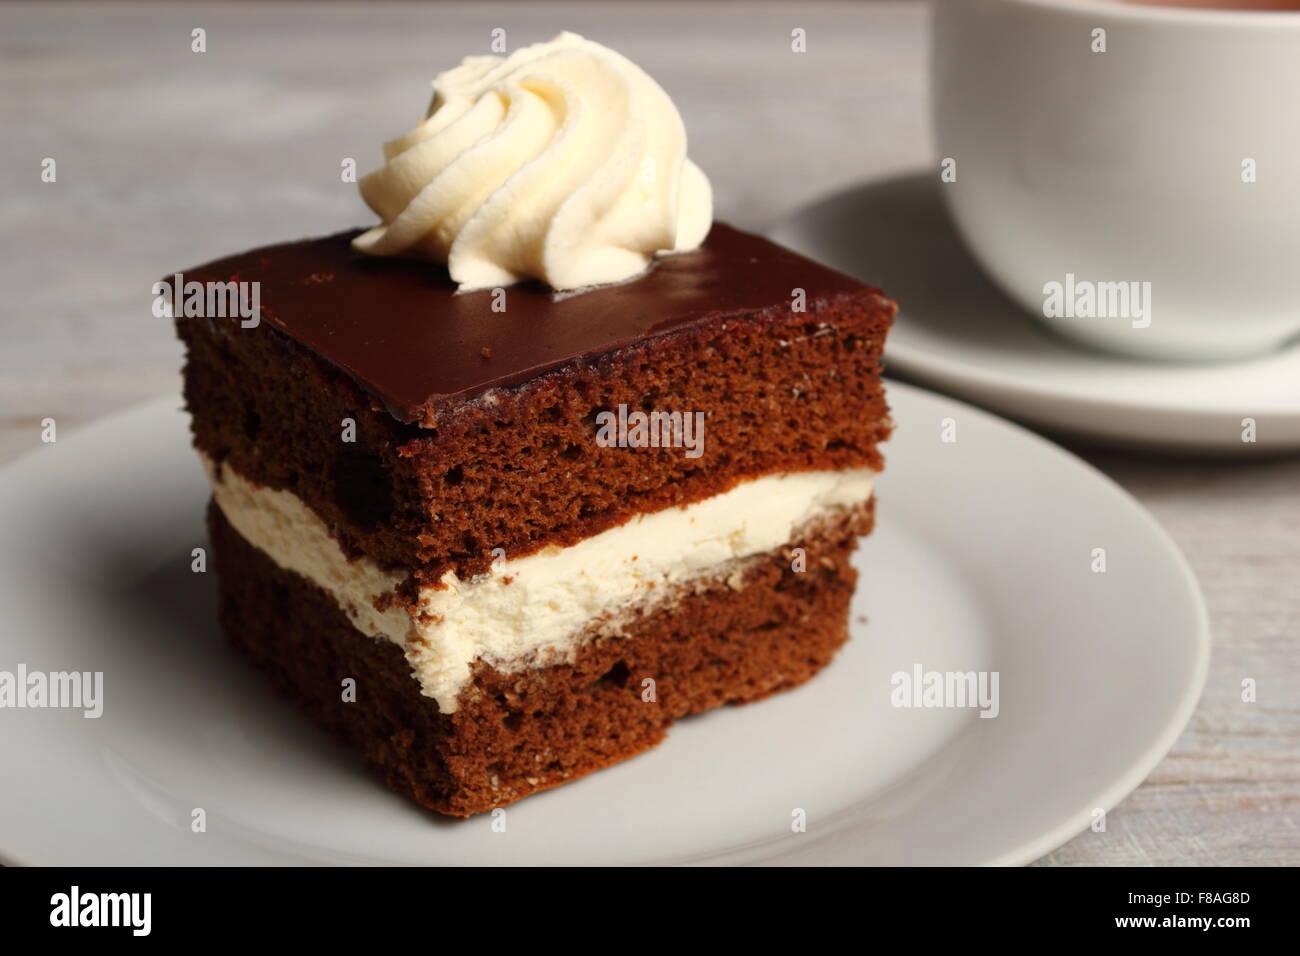 Cream Pie. Chocolate Sponge Cake filled with whipped cream Stock ...